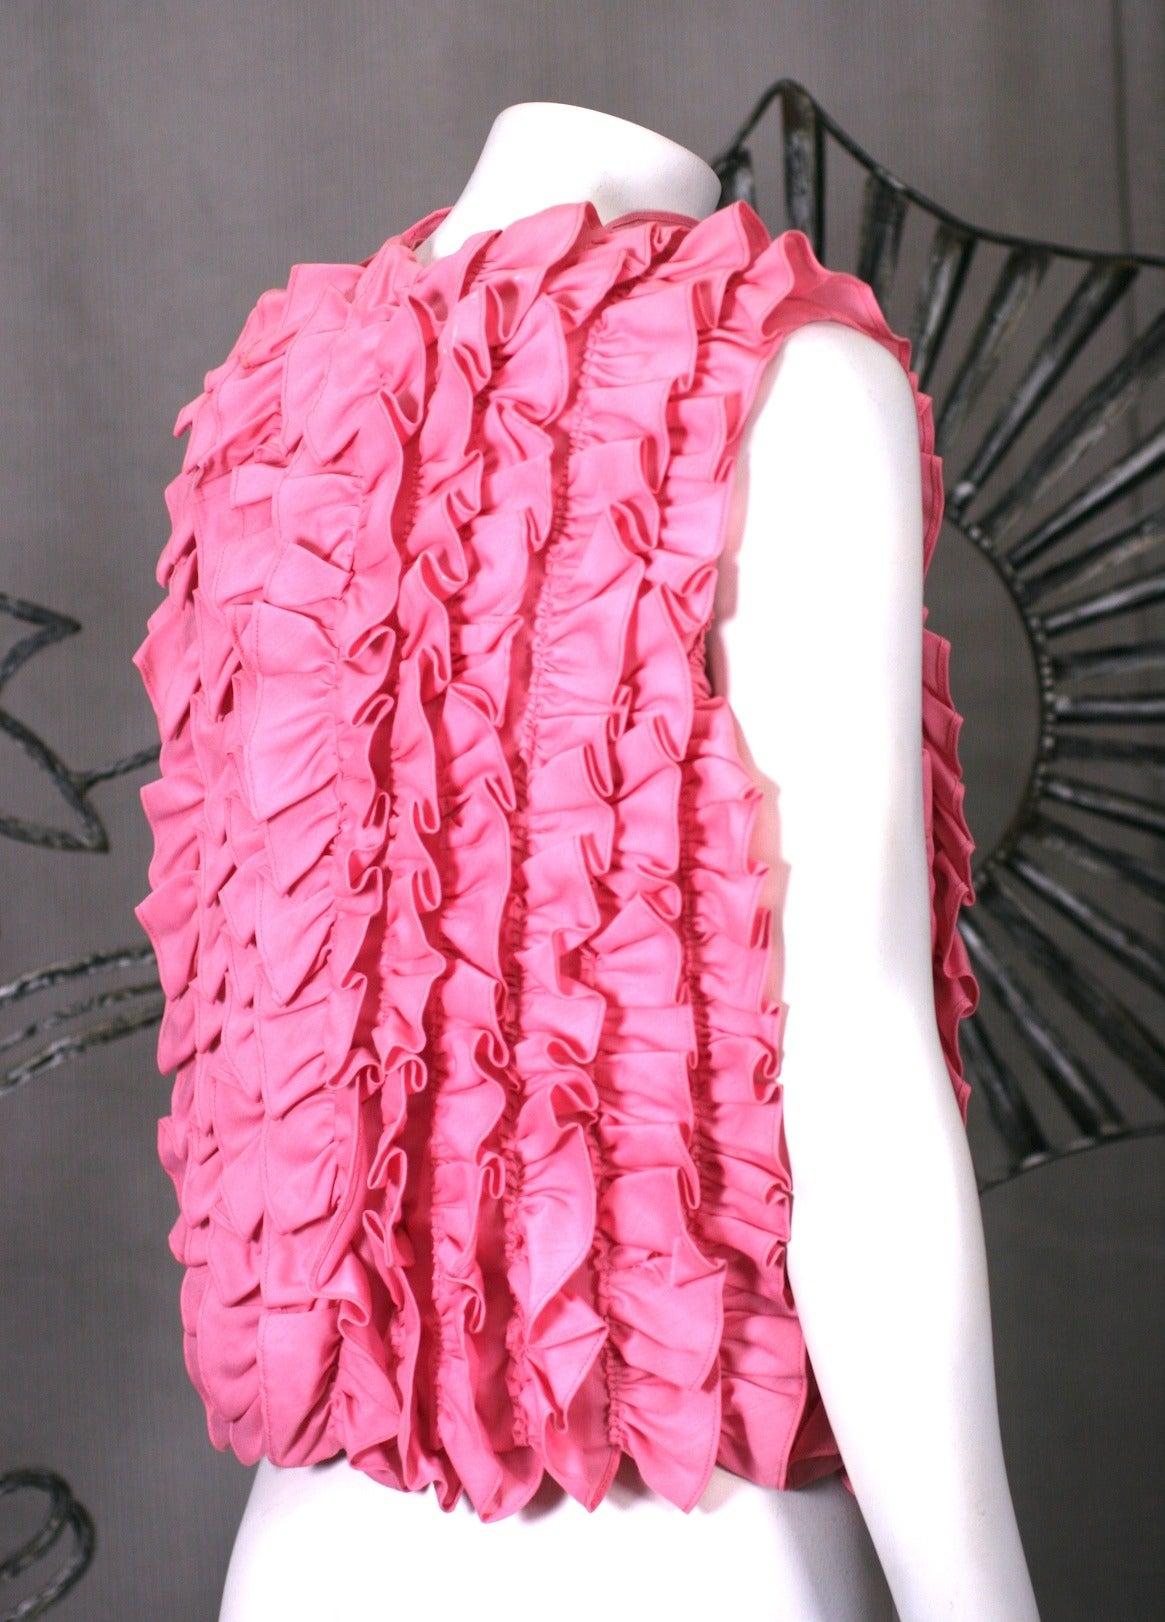 Pink Ruffled Sleeveless Blouse 2